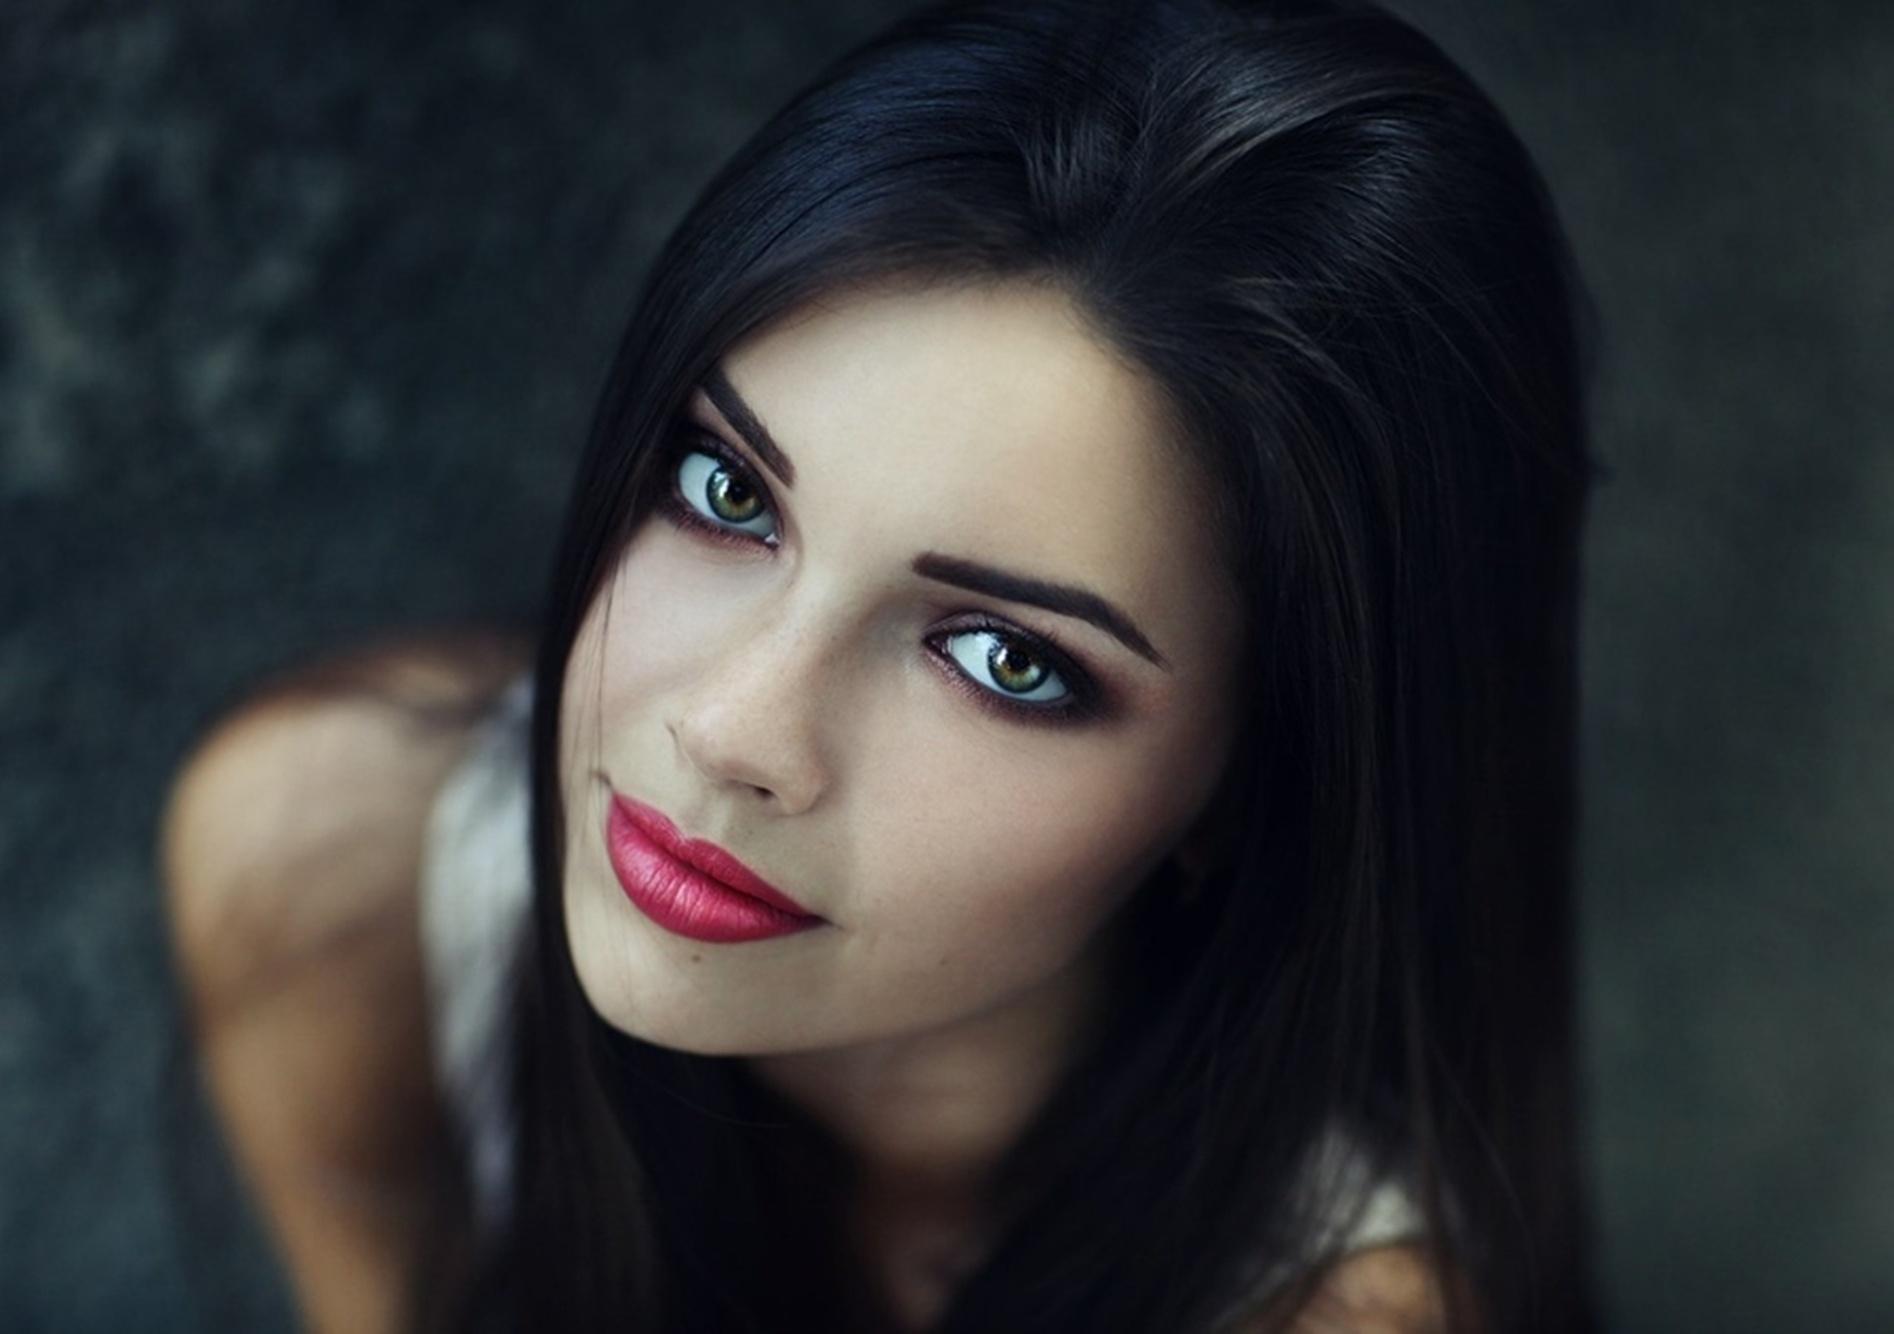 girl model face makeup wallpaper 59931 1894x1334px